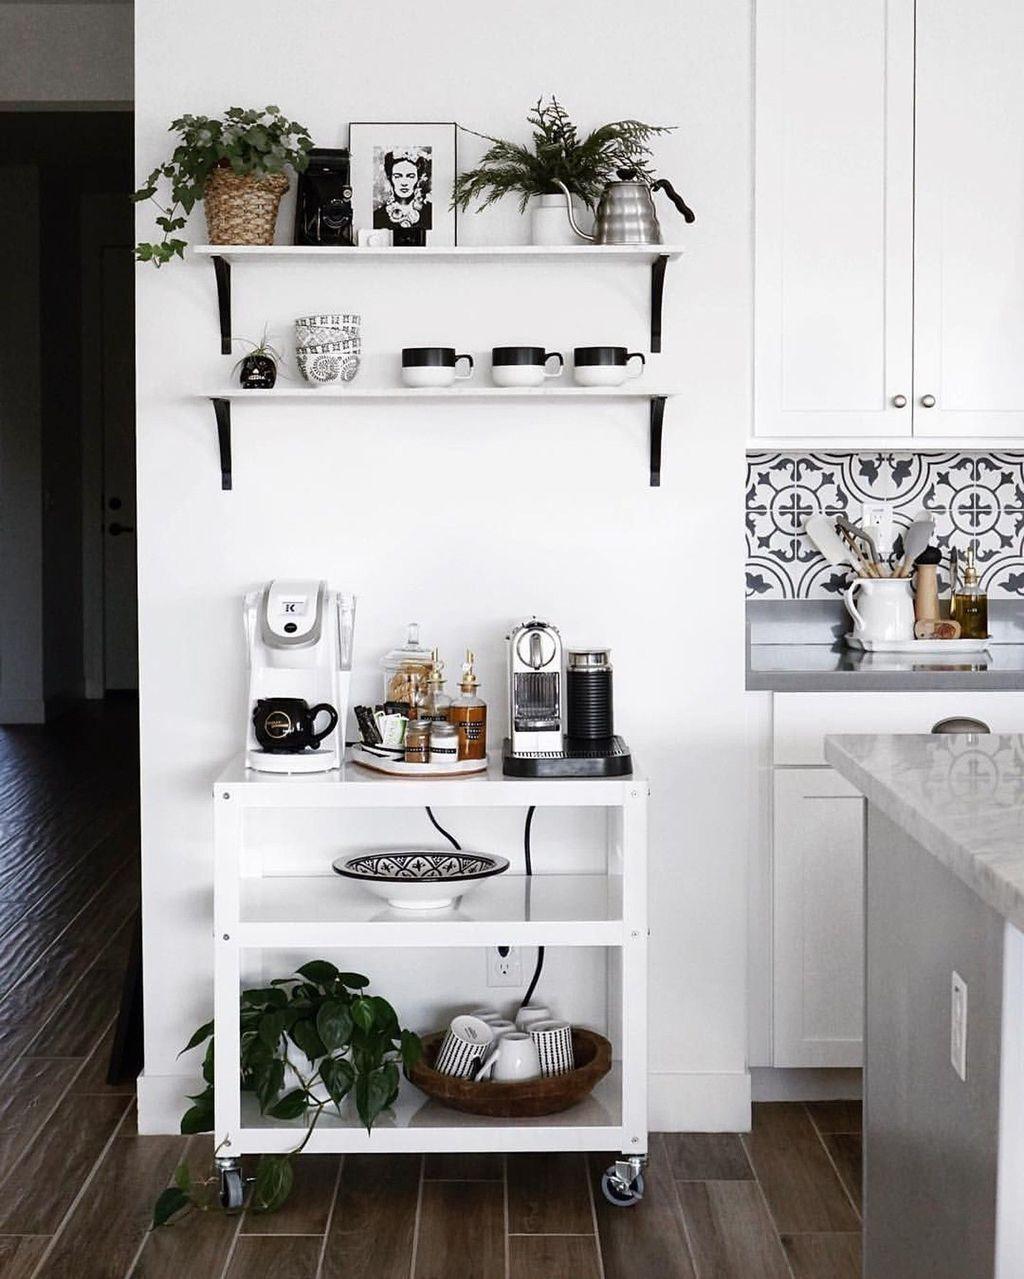 30+ Fantastic DIY Coffee Bar Ideas For Your Home #coffeebarideas